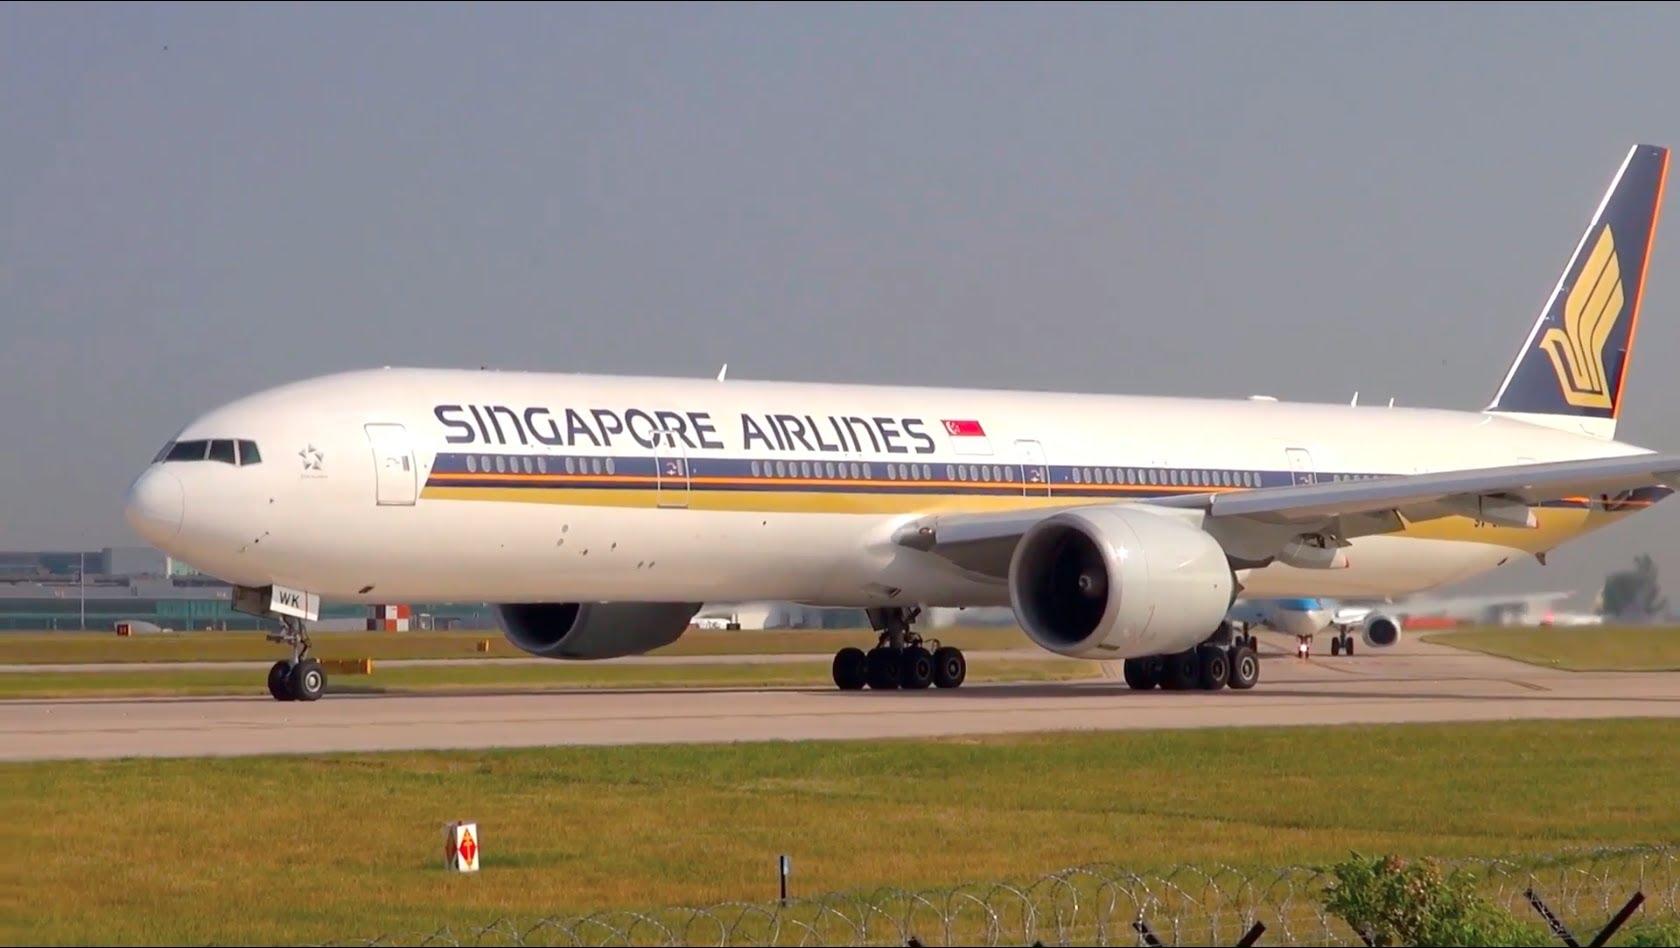 Singapore Airlines Boeing 777-300ER (Foto: AusAviation149)